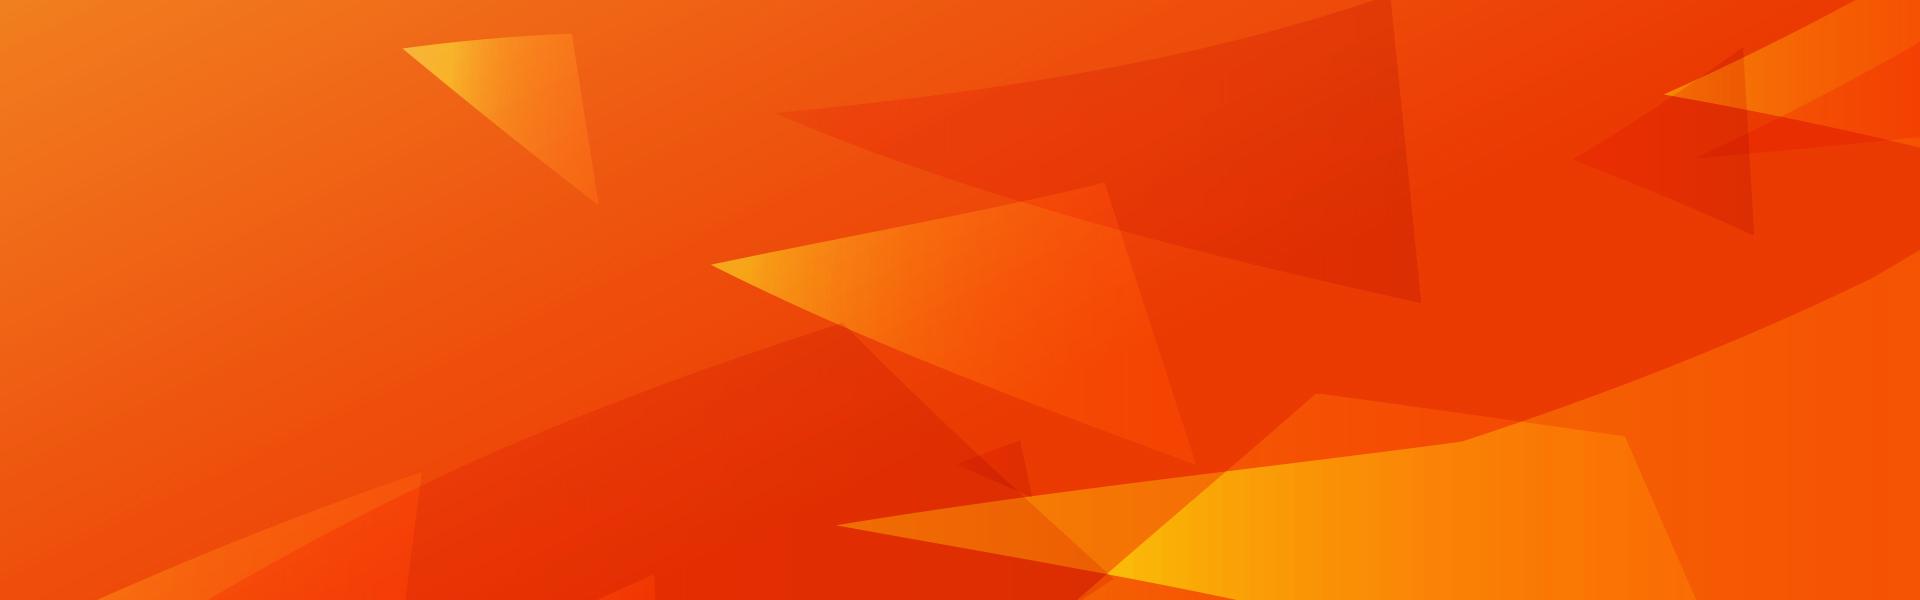 Orange Background Orange Geometry Poster Background